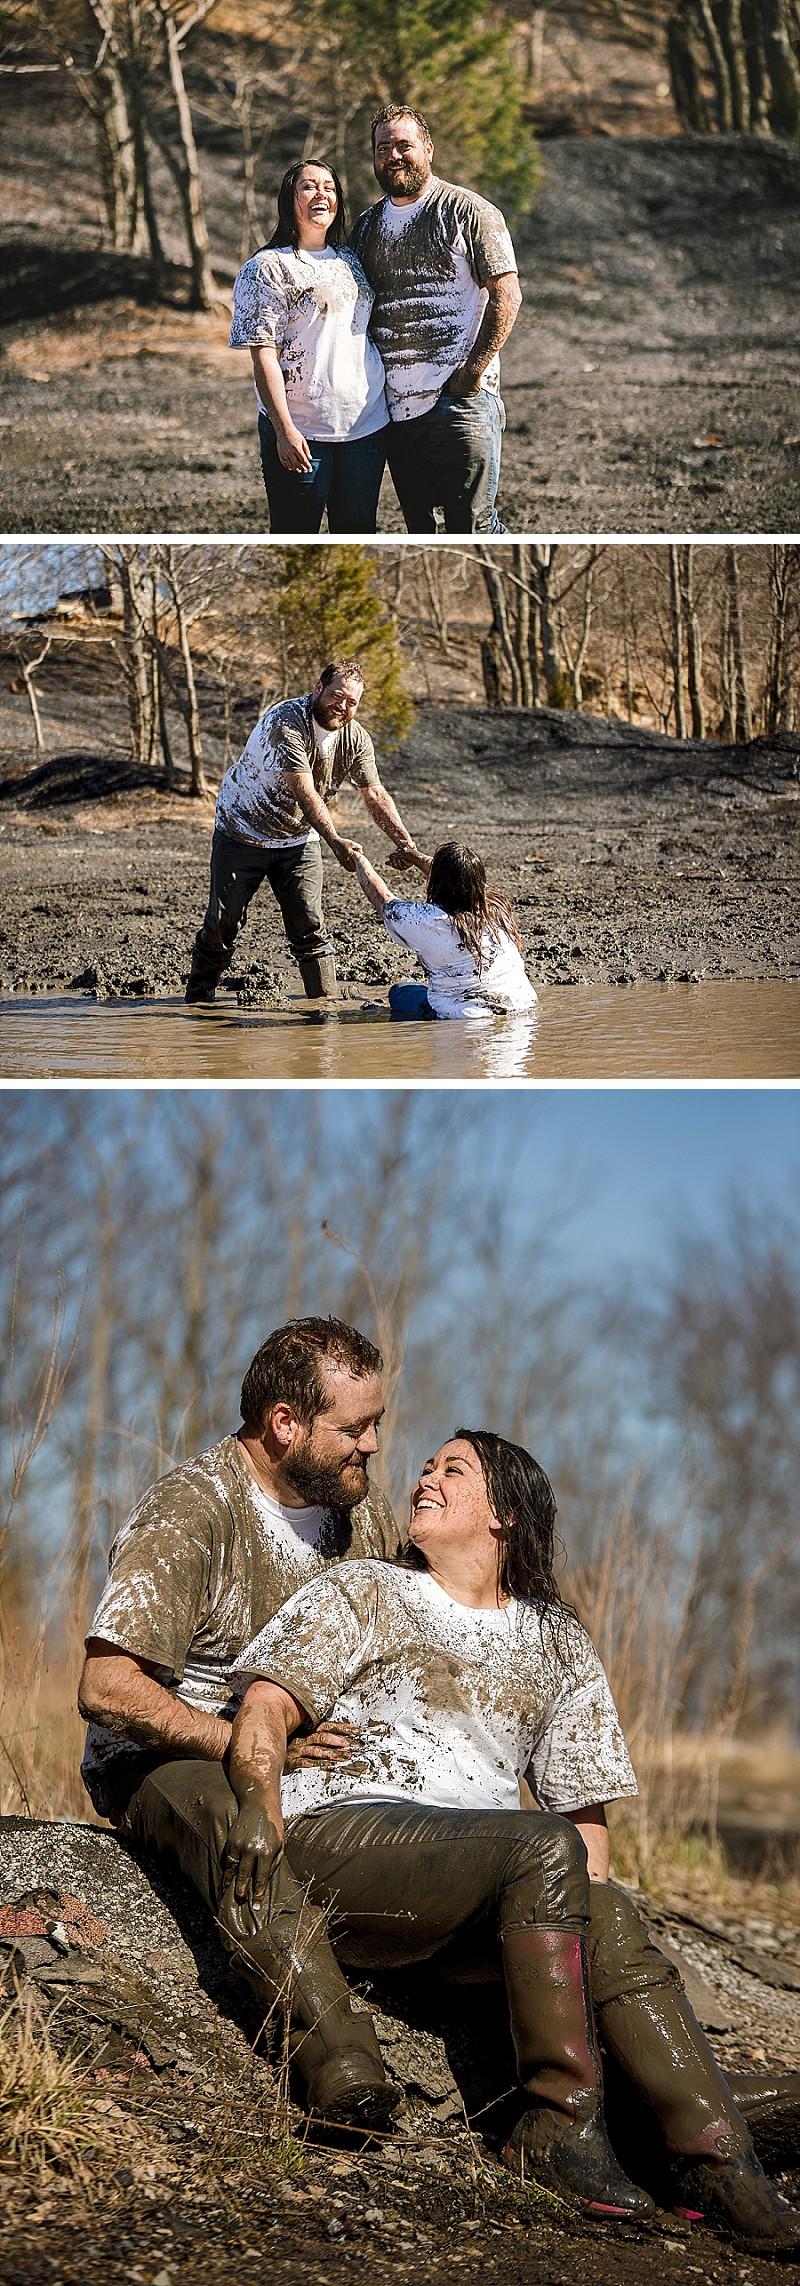 Muddy but still having fun